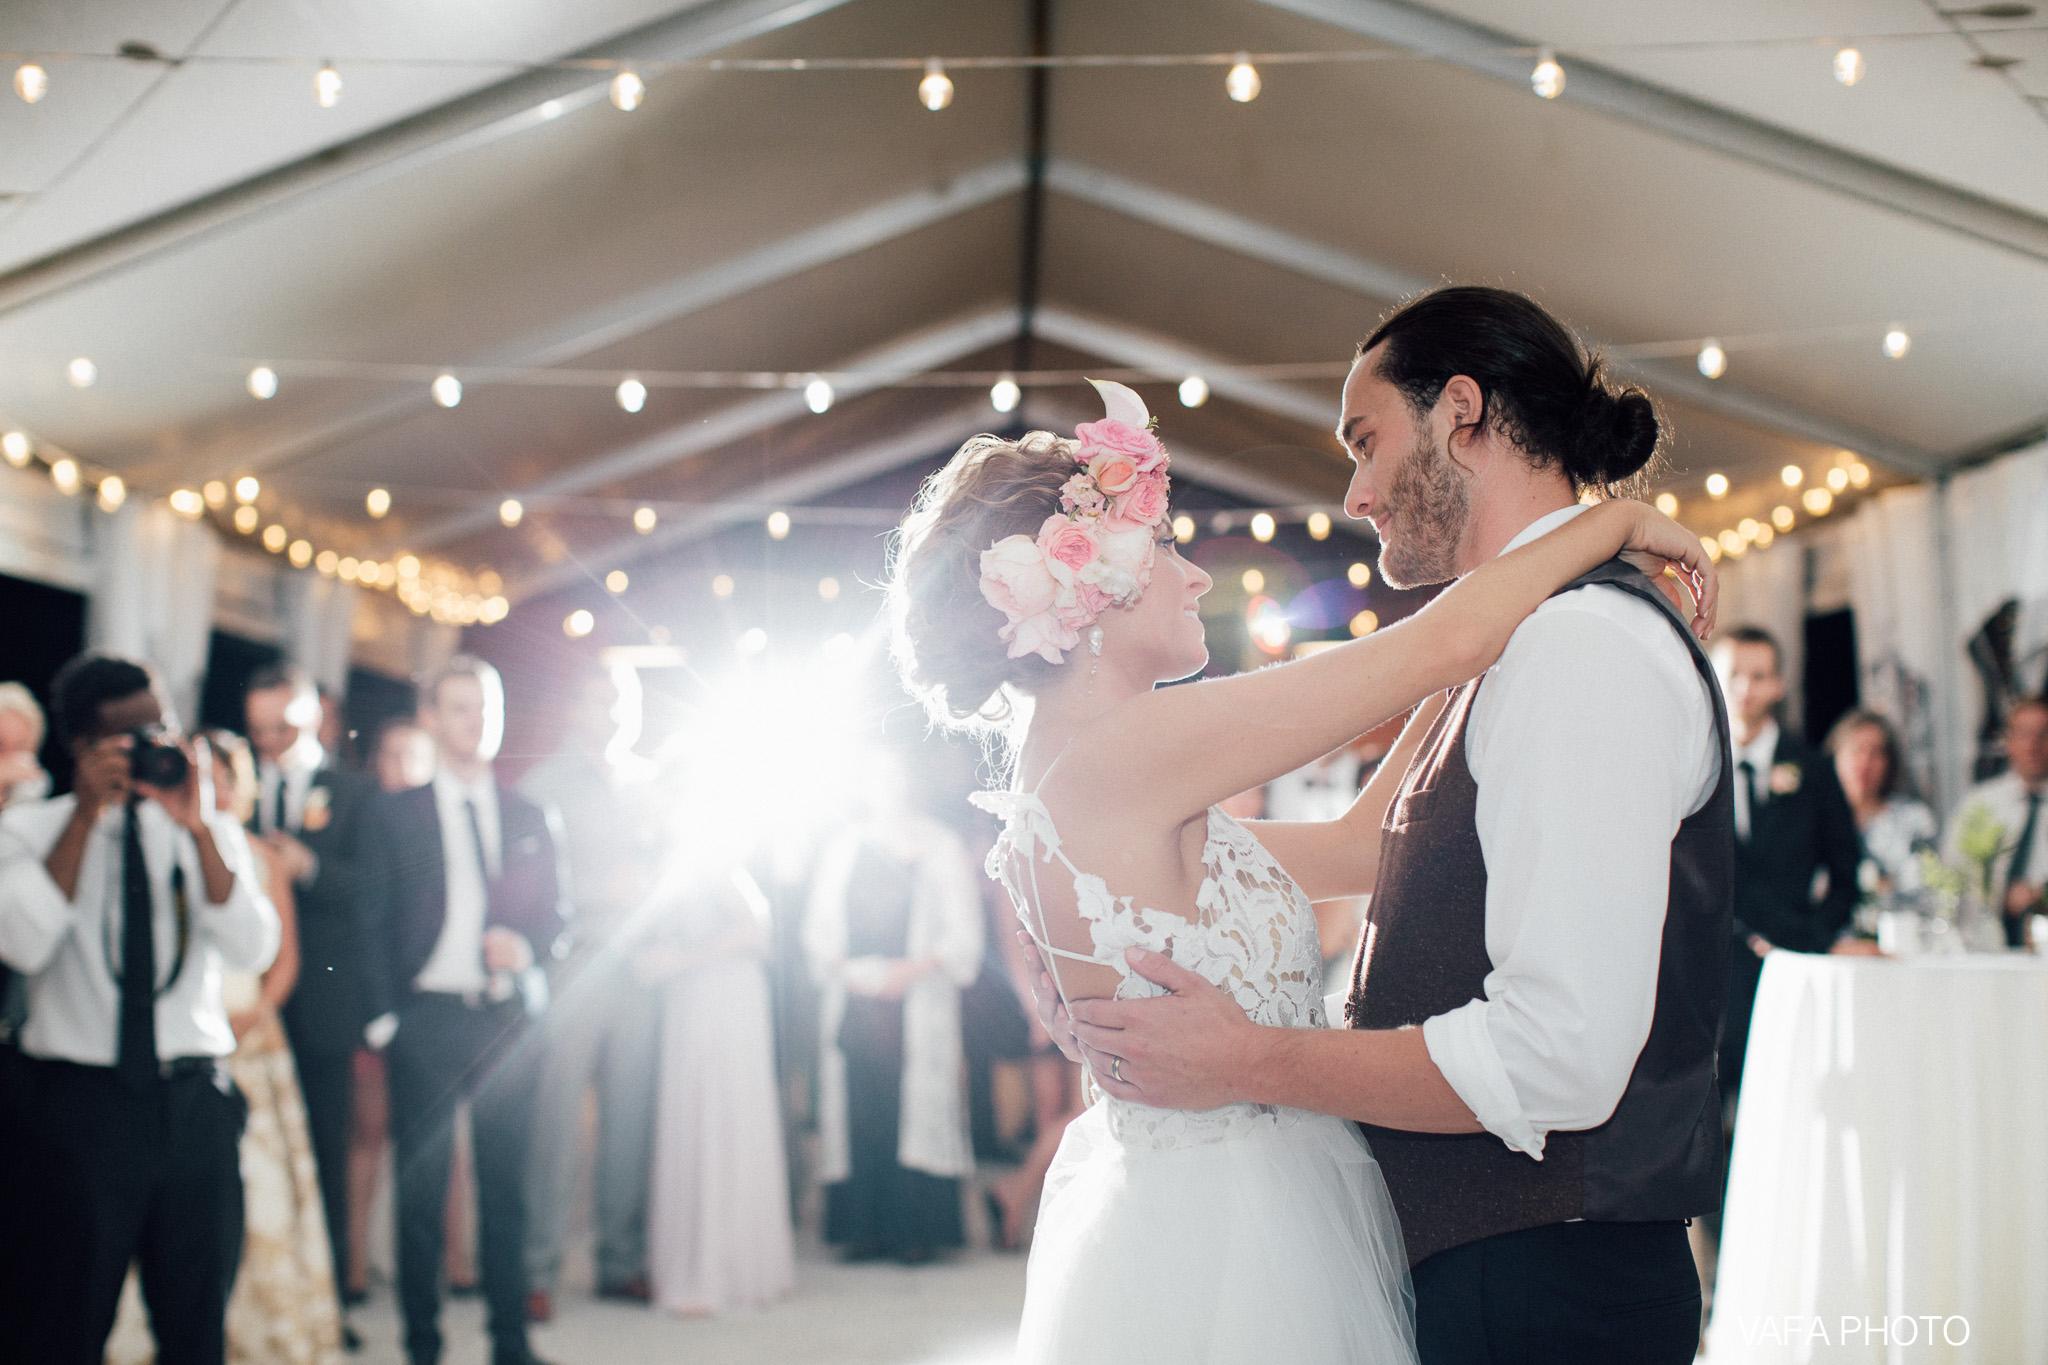 The-Felt-Estate-Wedding-Kailie-David-Vafa-Photo-1087.jpg